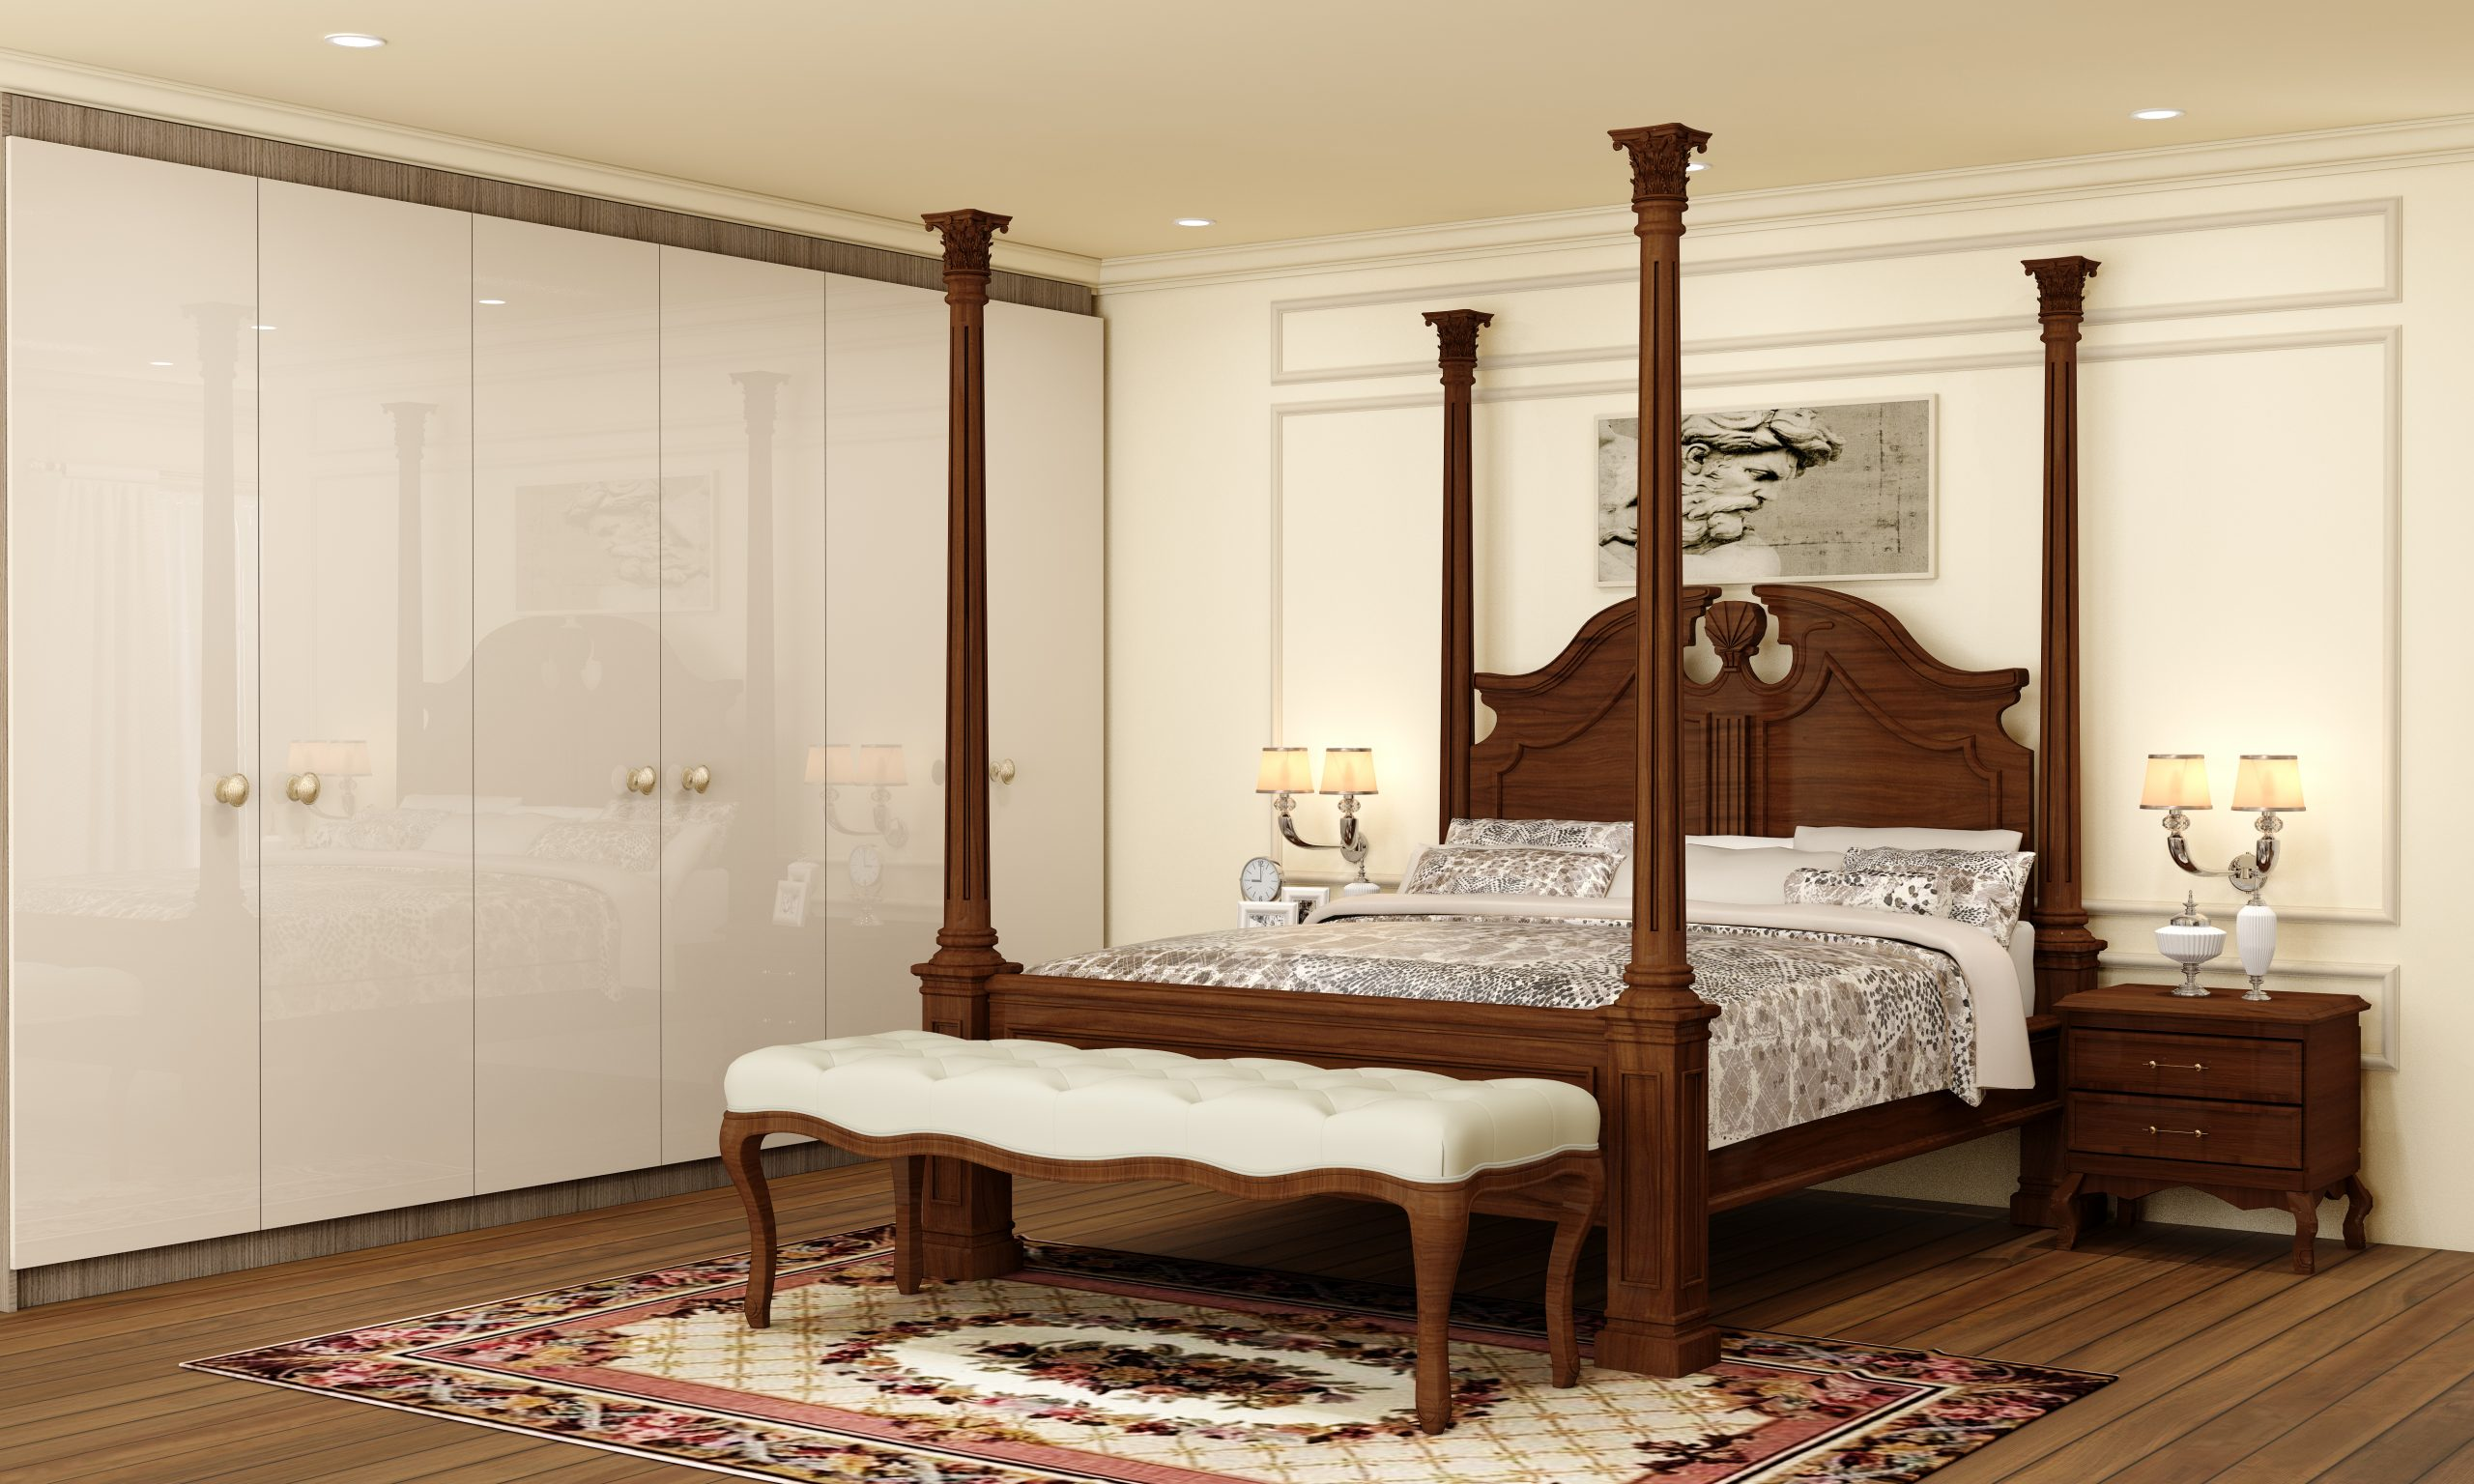 Traditional bedroom wardrobe storage in acrylic cashmere grey gloss finish